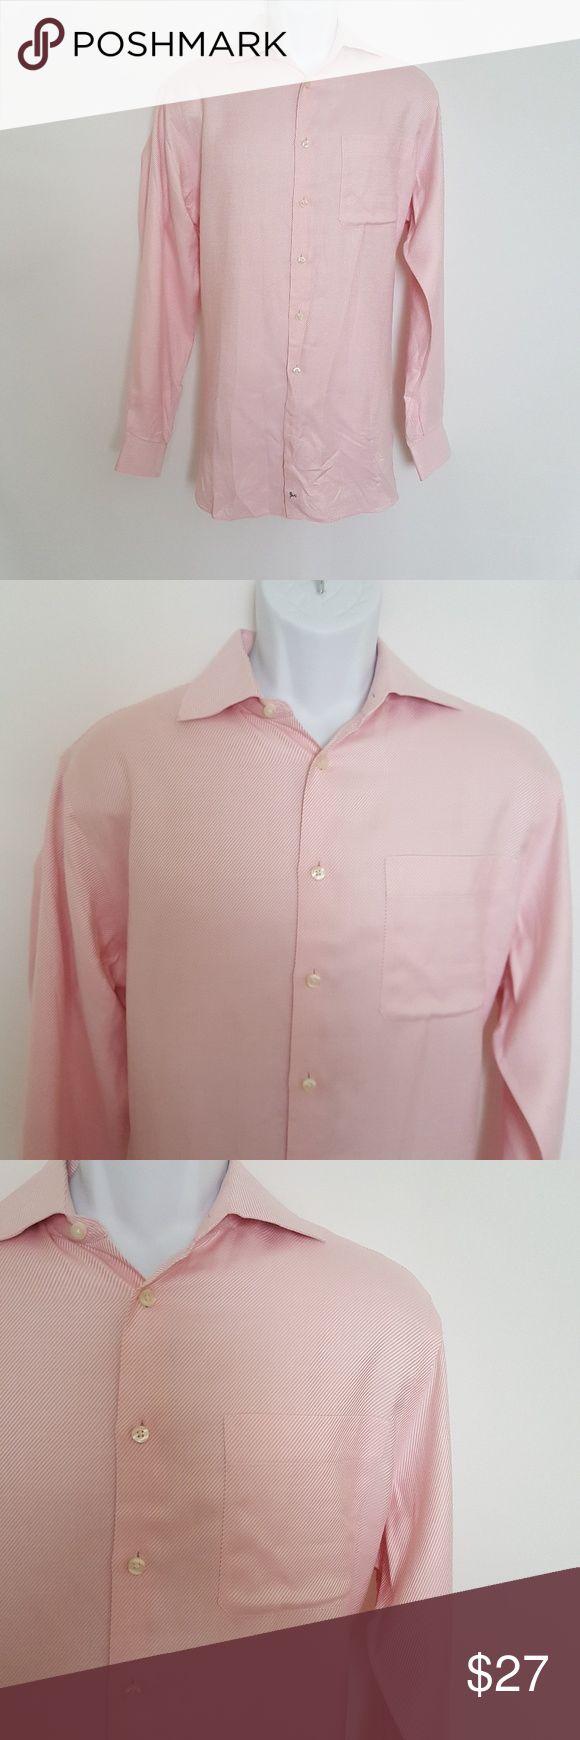 John w nordstrom pink longsleeves mens shirt sz s